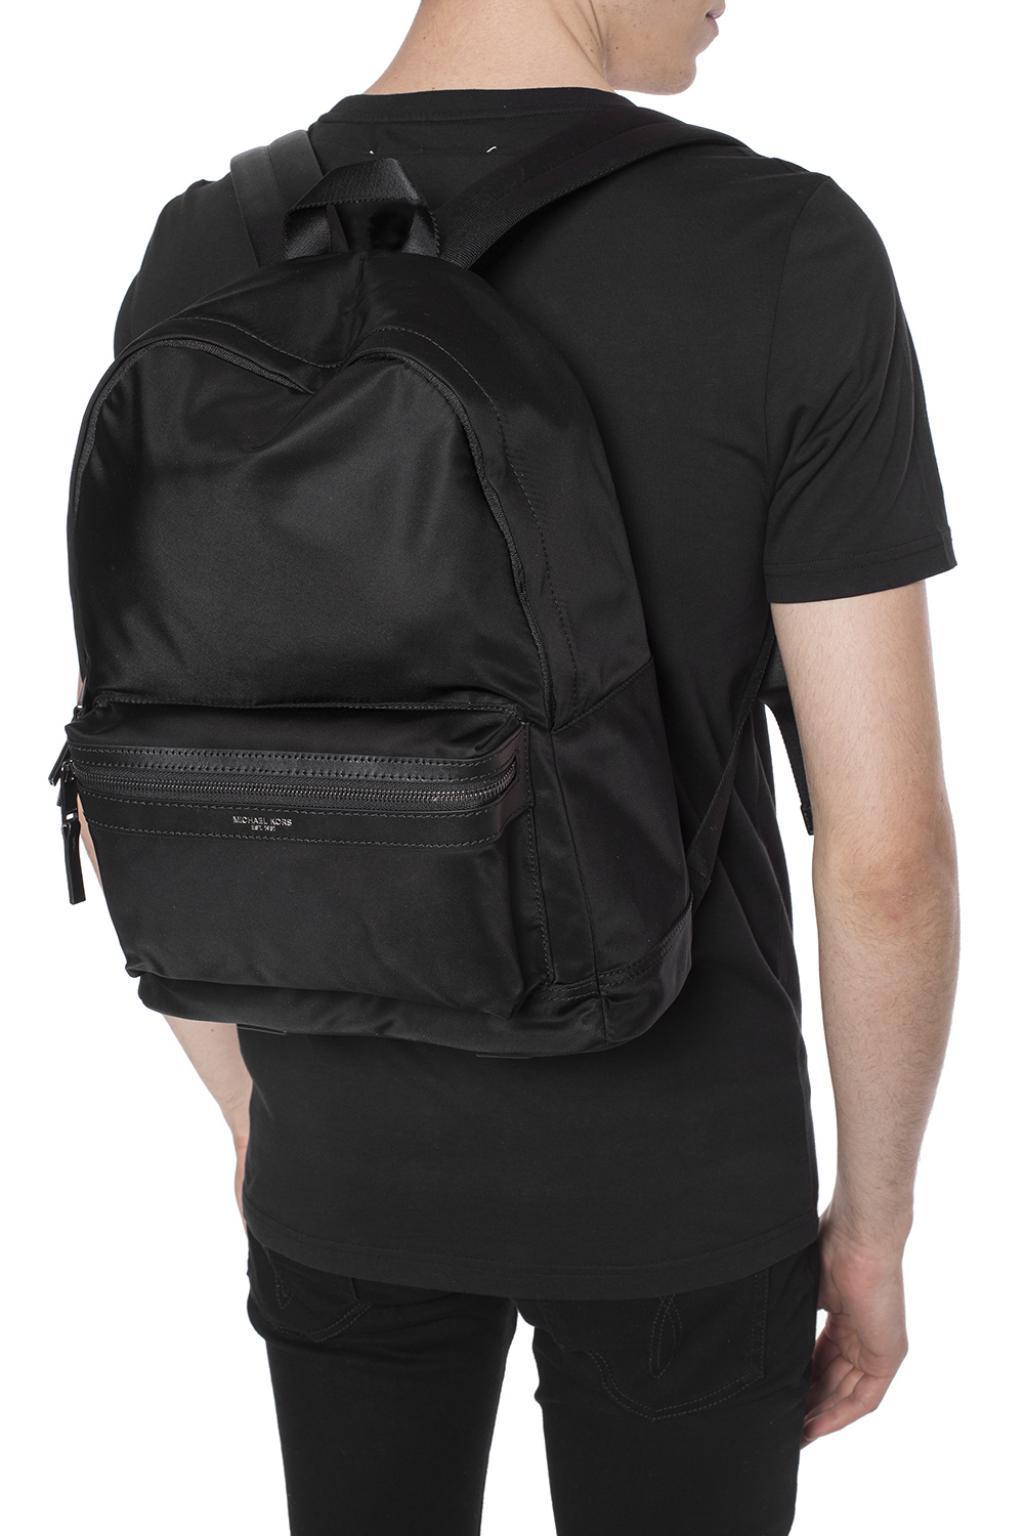 0e9b93fa83c4 Michael Kors - Black  kent  Backpack for Men - Lyst. View fullscreen